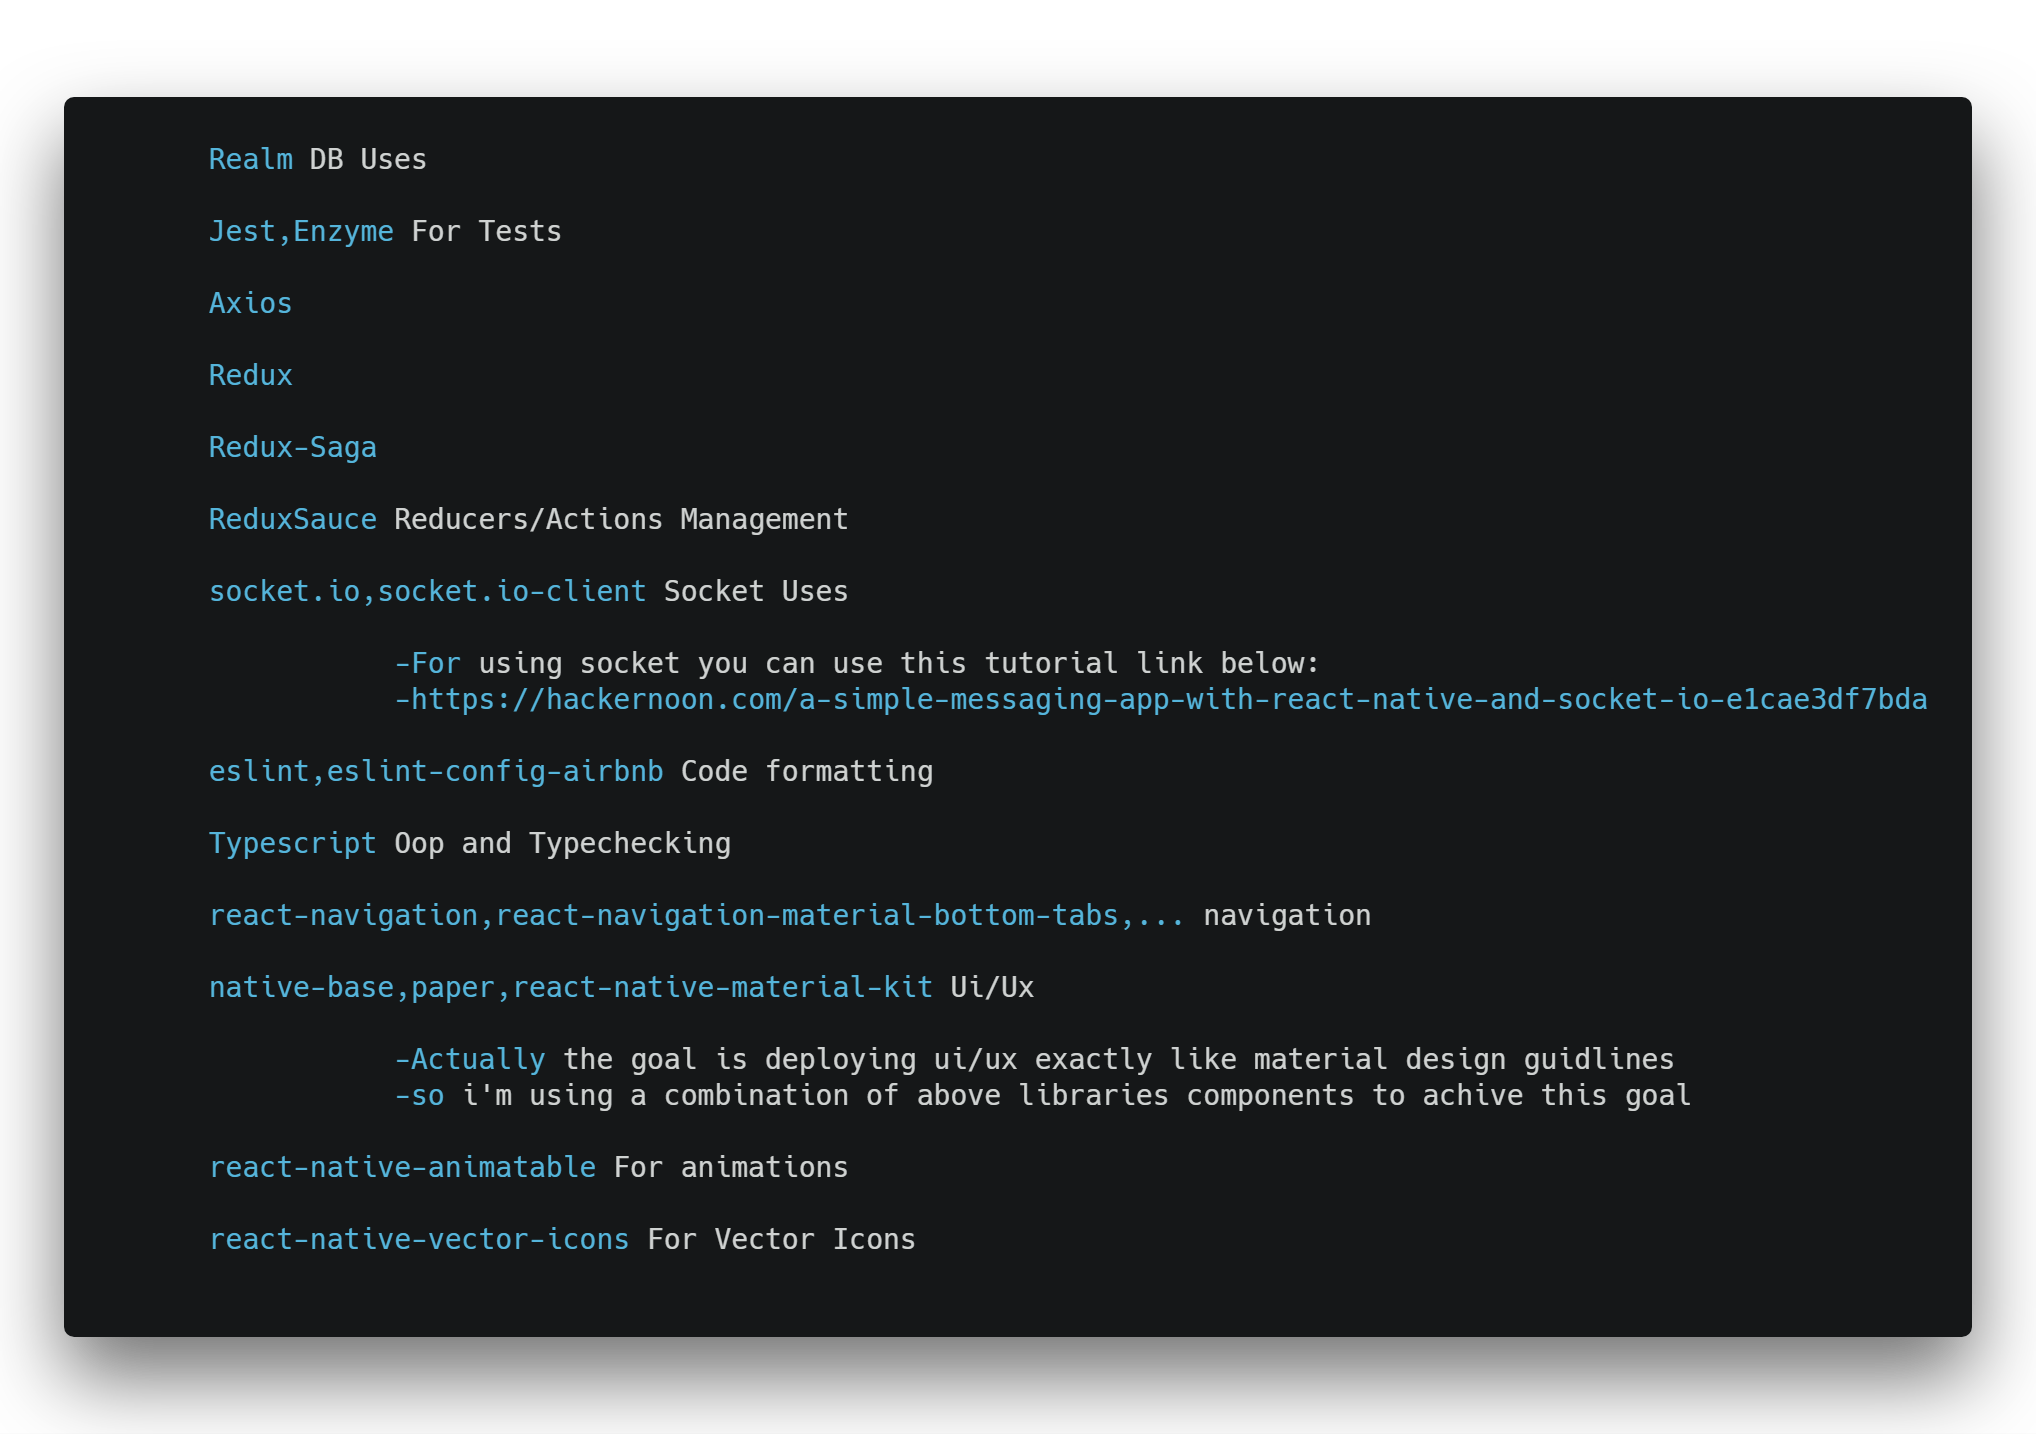 ignite-boilerplate-andross-typescript 0 1 83 on npm - Libraries io